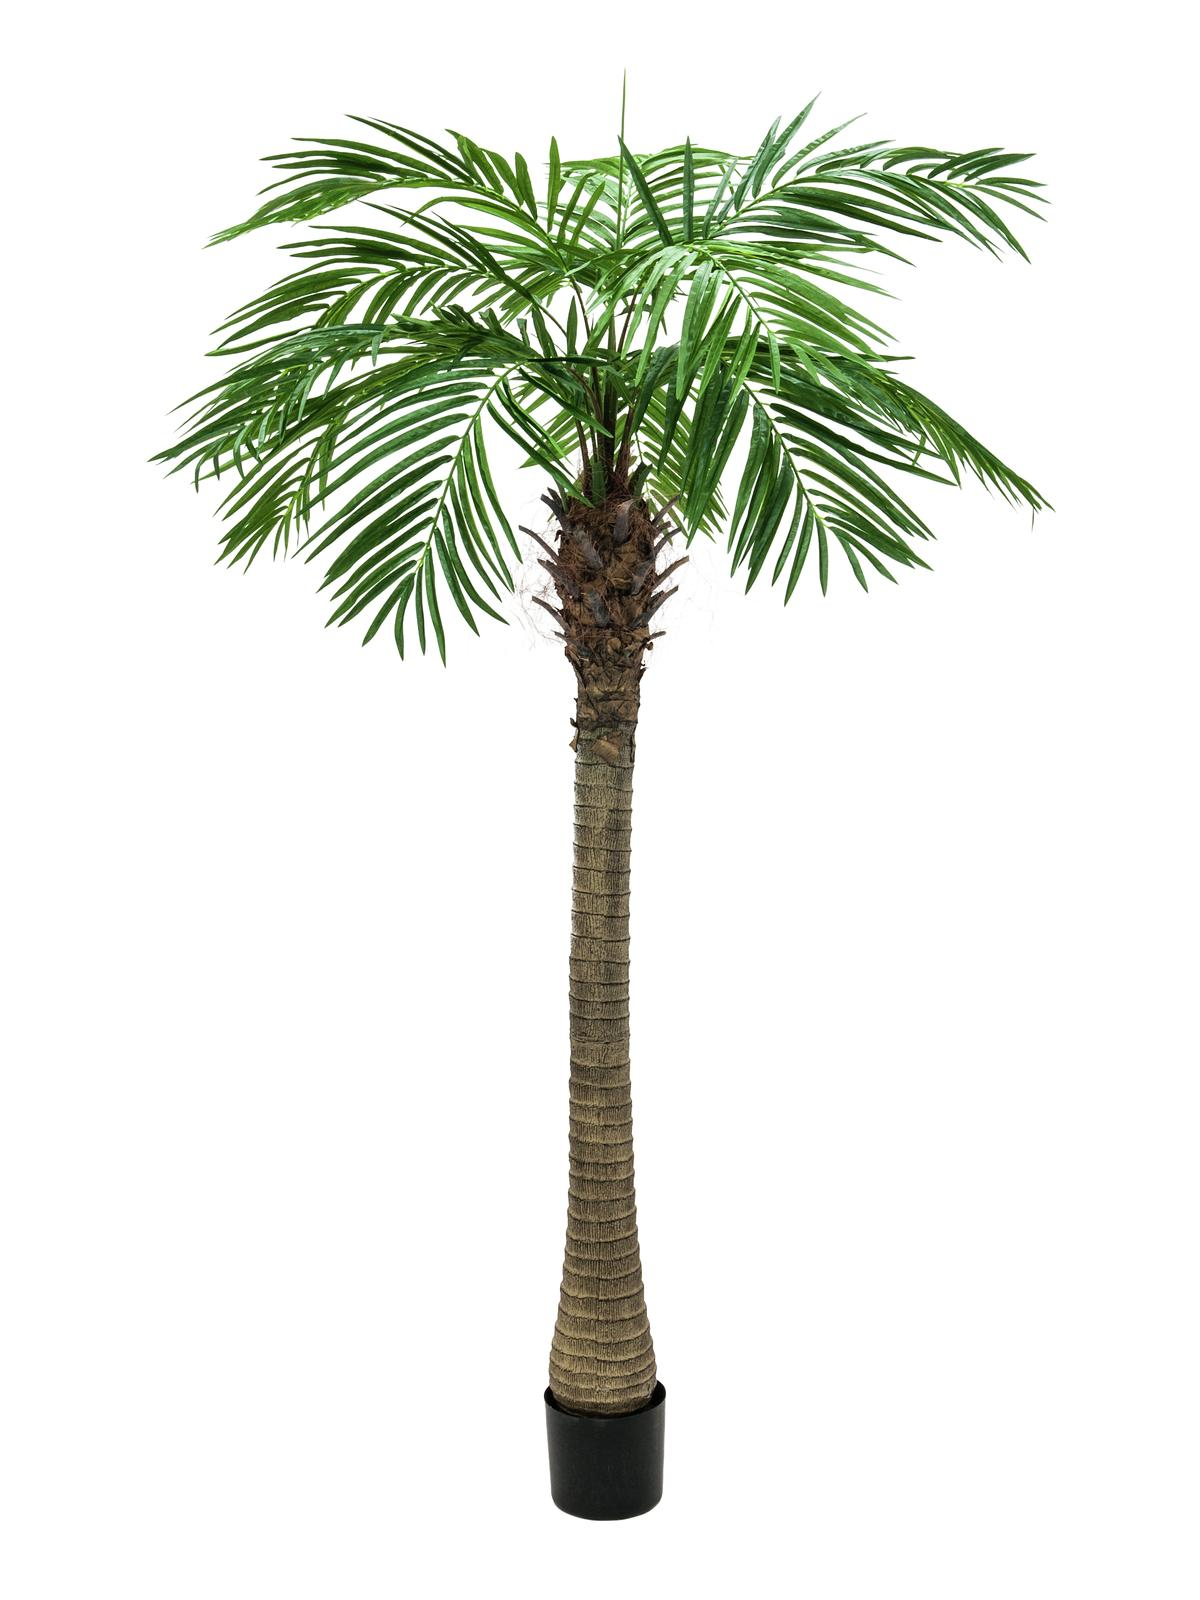 EUROPALMS pianta artificiale Phoenix palma di lusso, 300cm